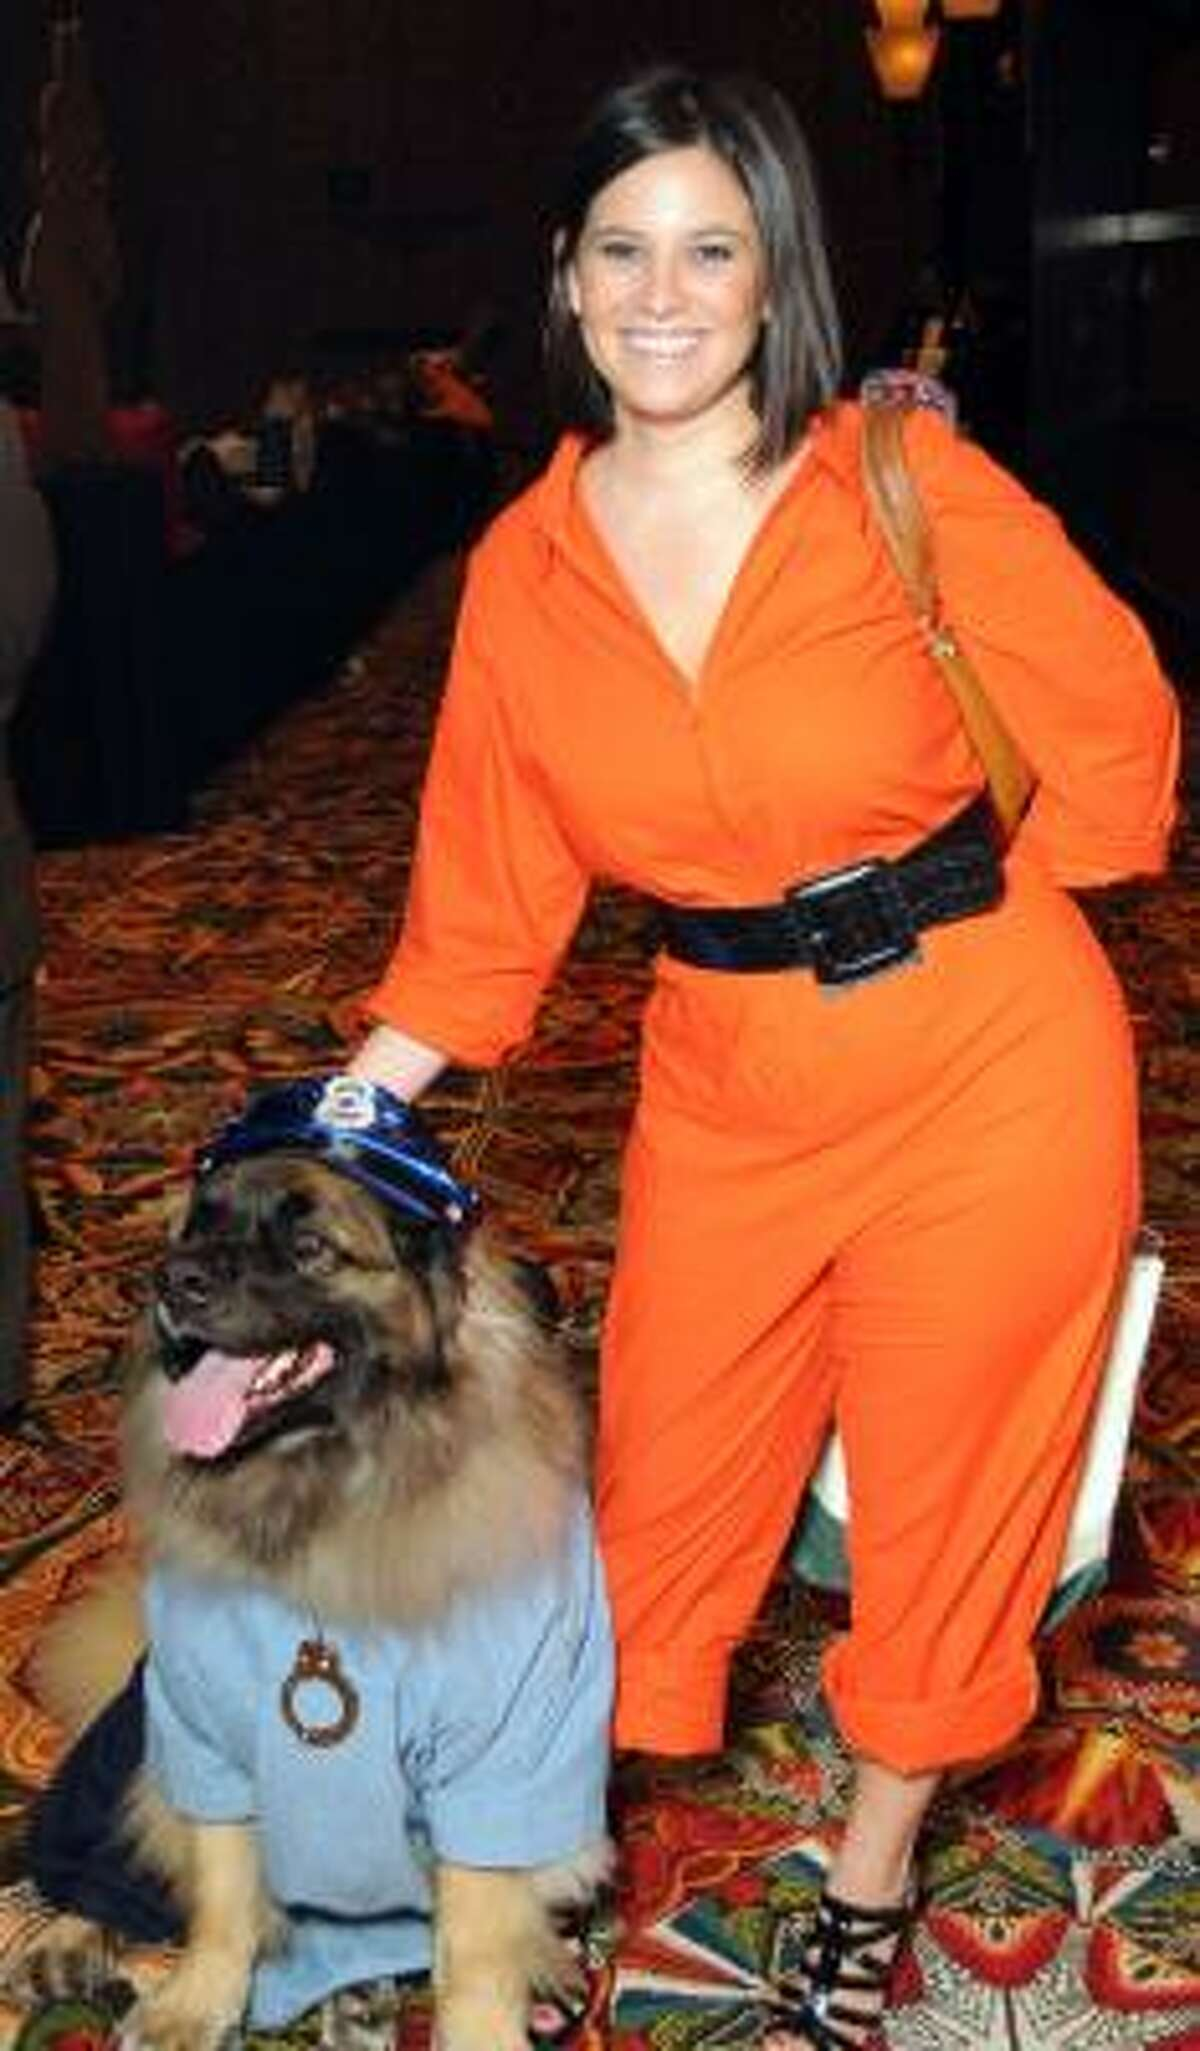 Noell Myska with Chewbacca